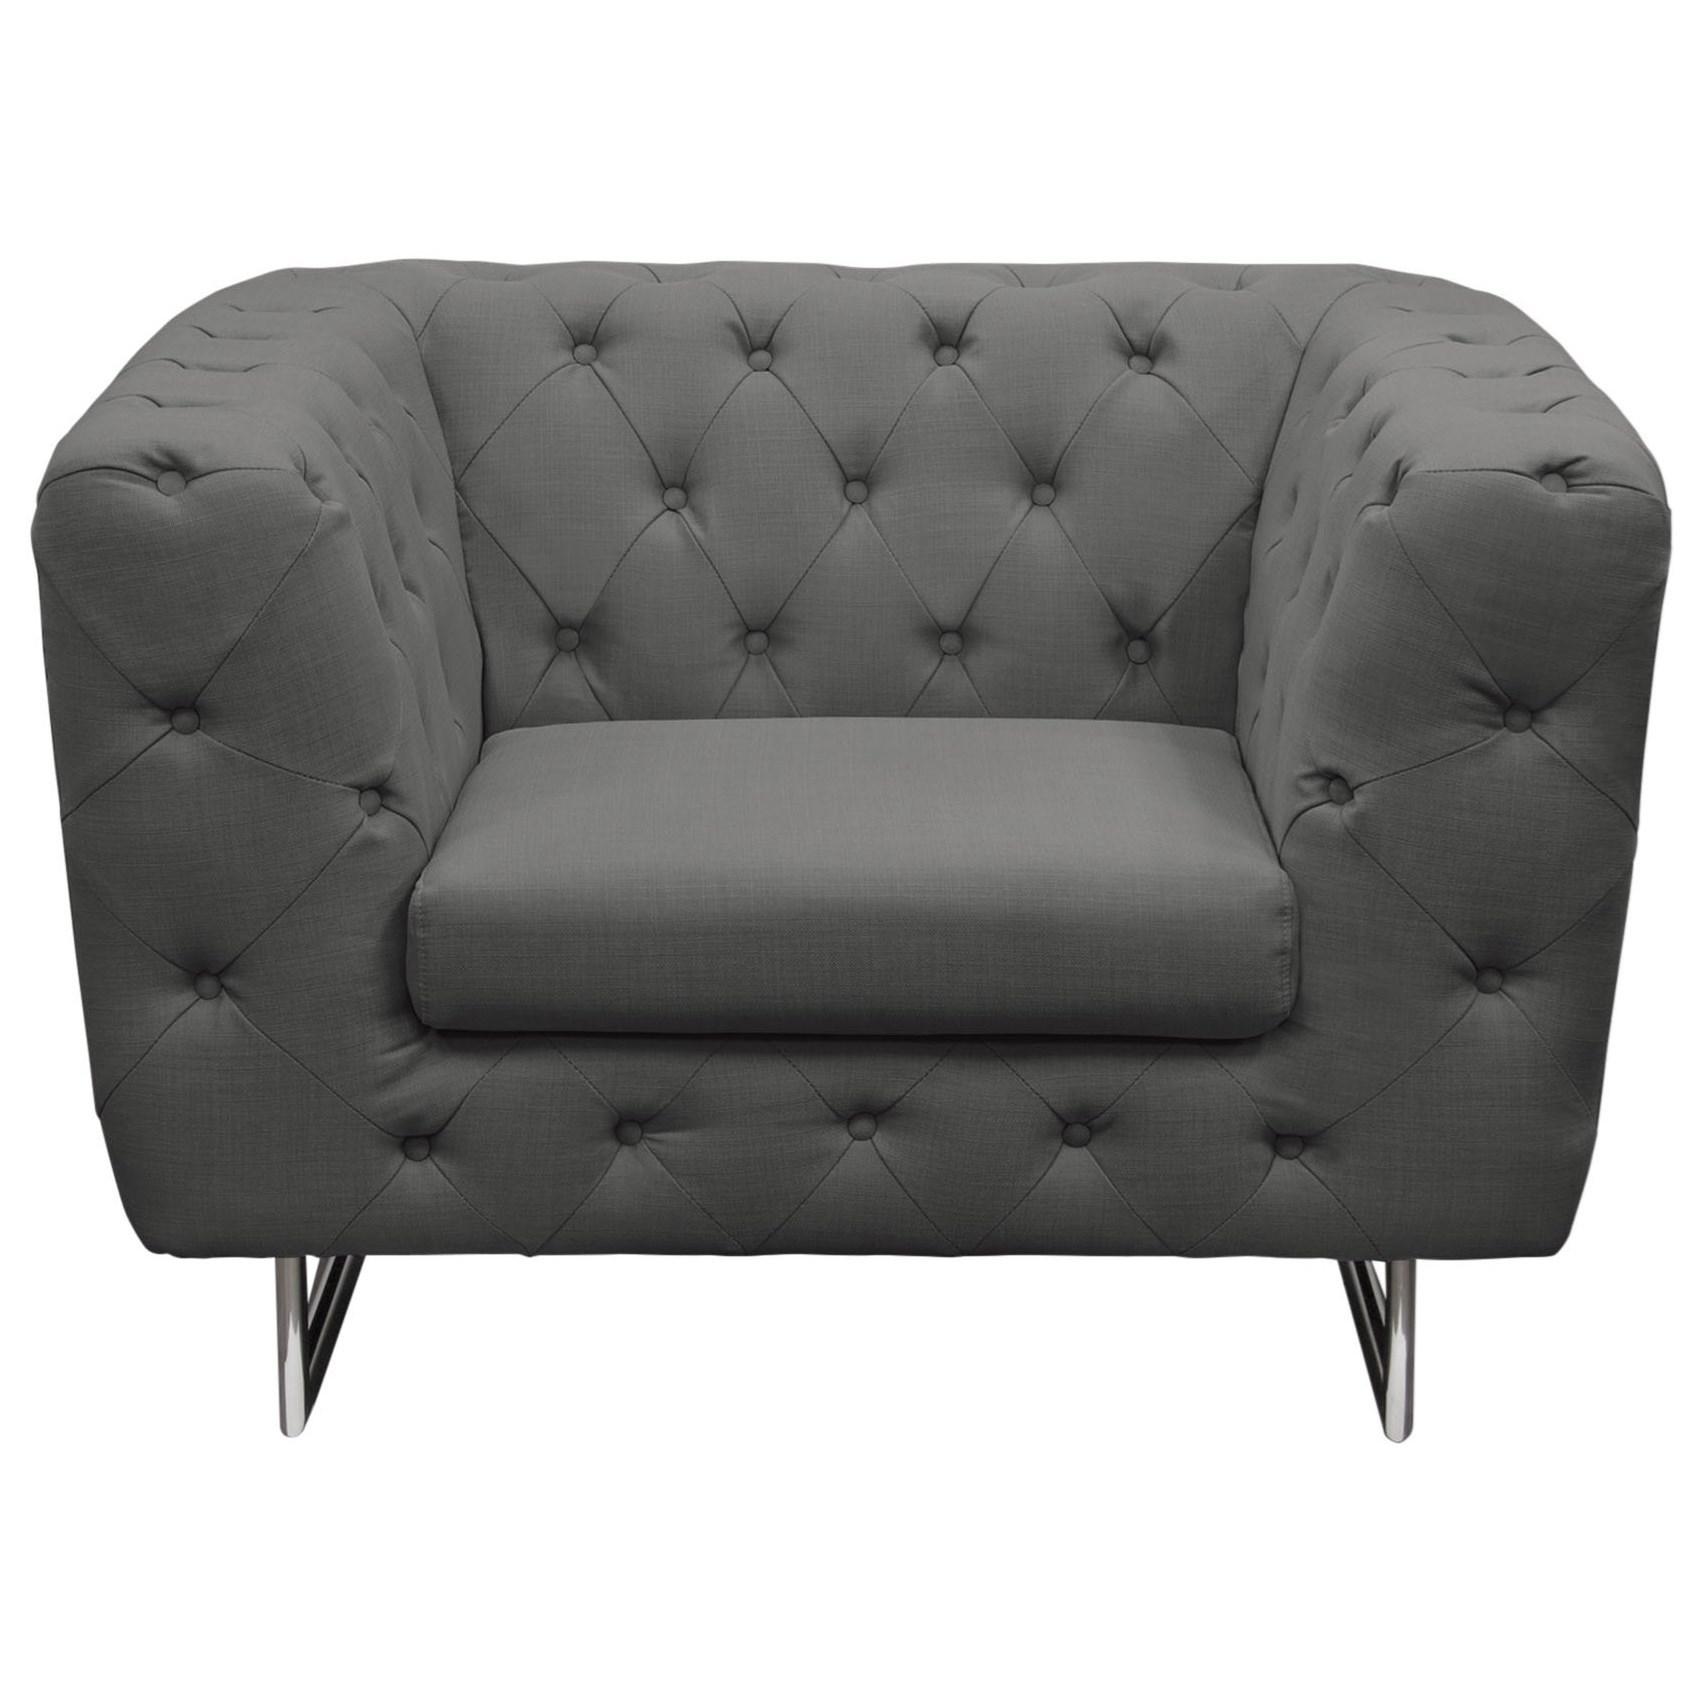 Diamond Sofa Catalina Chair Item Number Catalinachgr